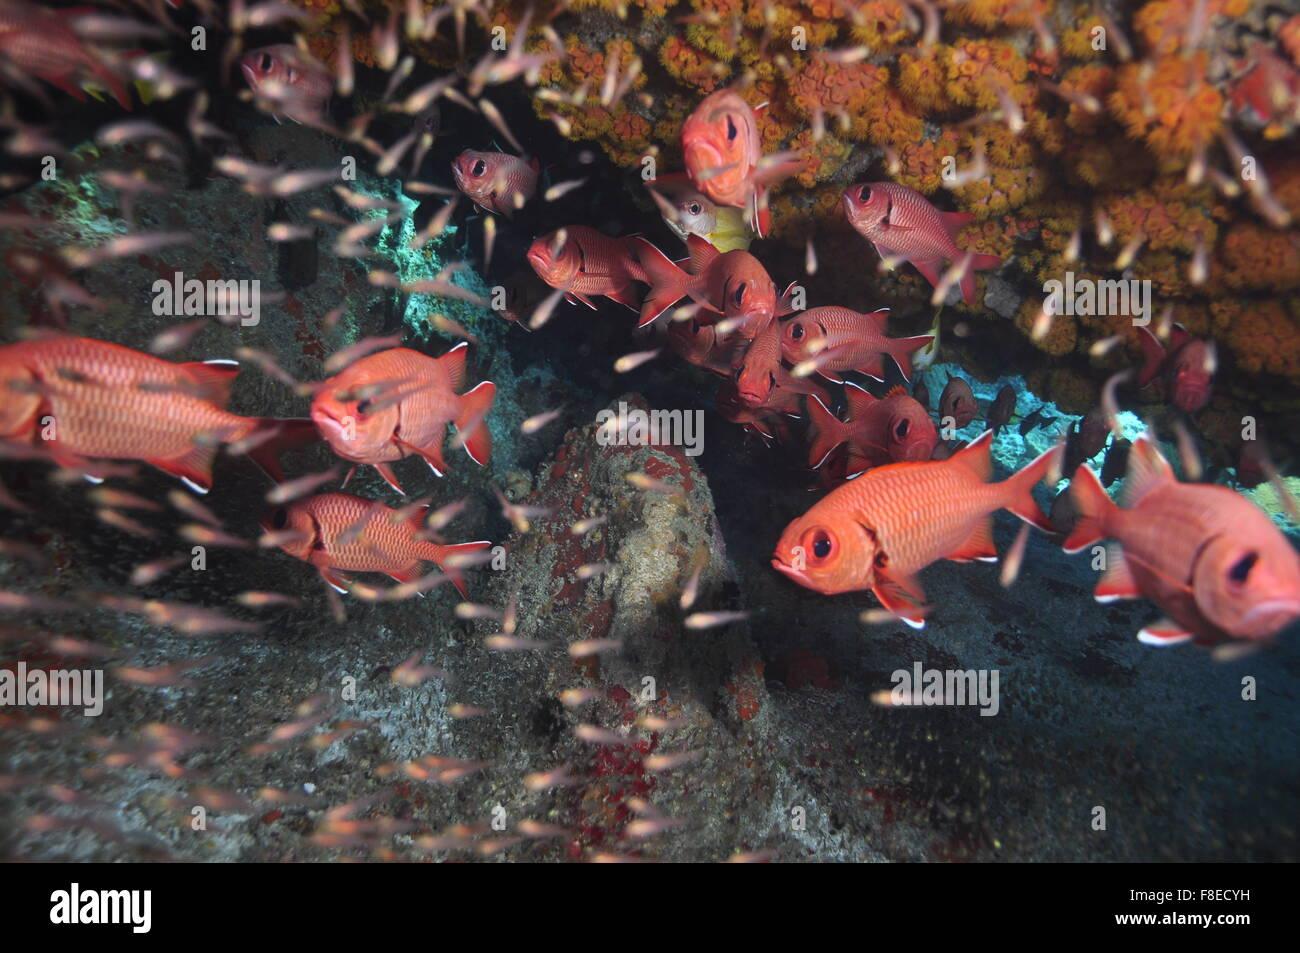 Myripristis murdjan, Scuba diver with school of soldier fish - Stock Image